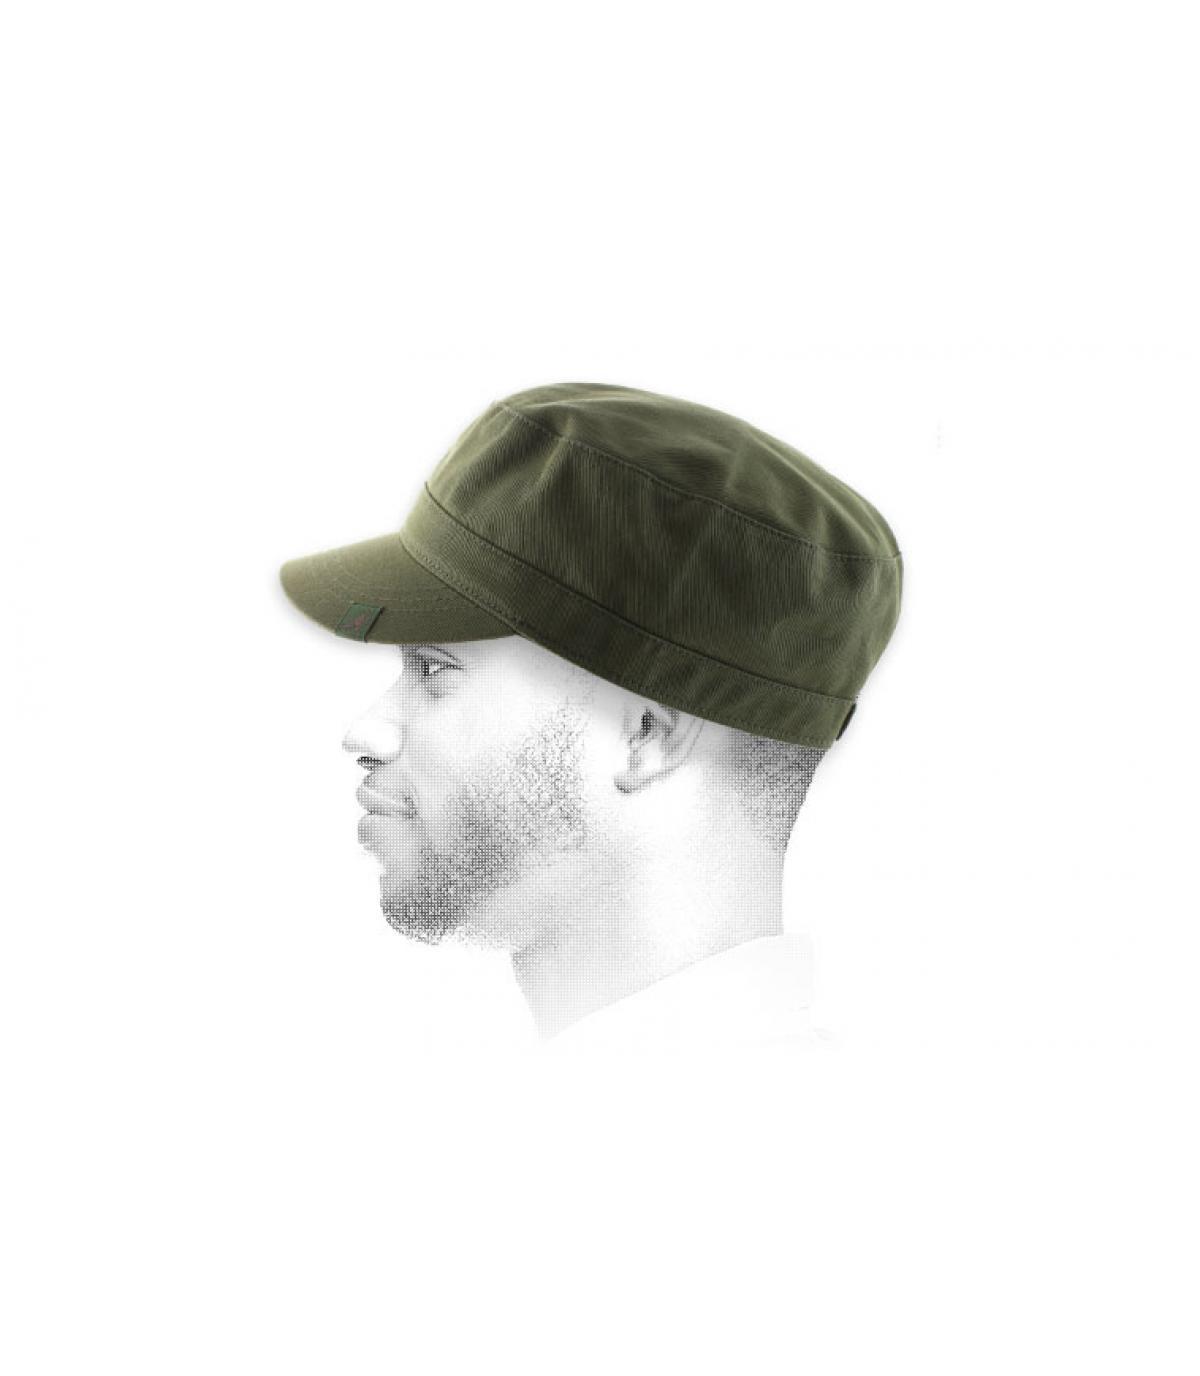 Kangol beigefarbene Army Cap